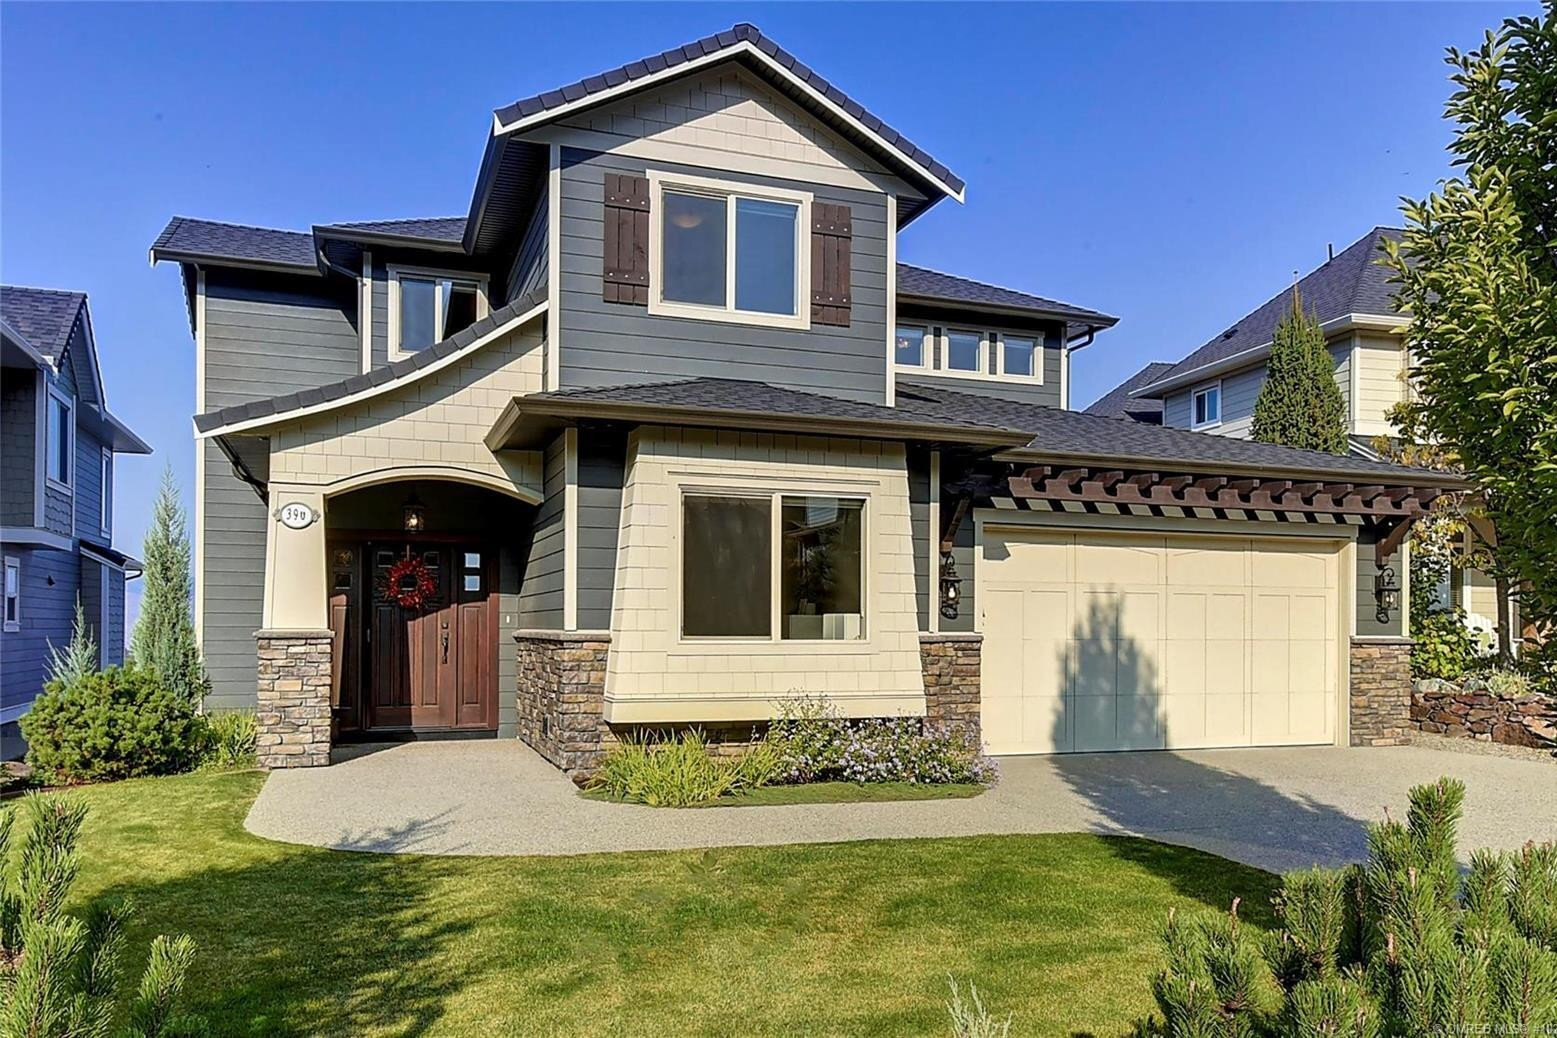 House for sale at 390 Rindle Ct Kelowna British Columbia - MLS: 10217762